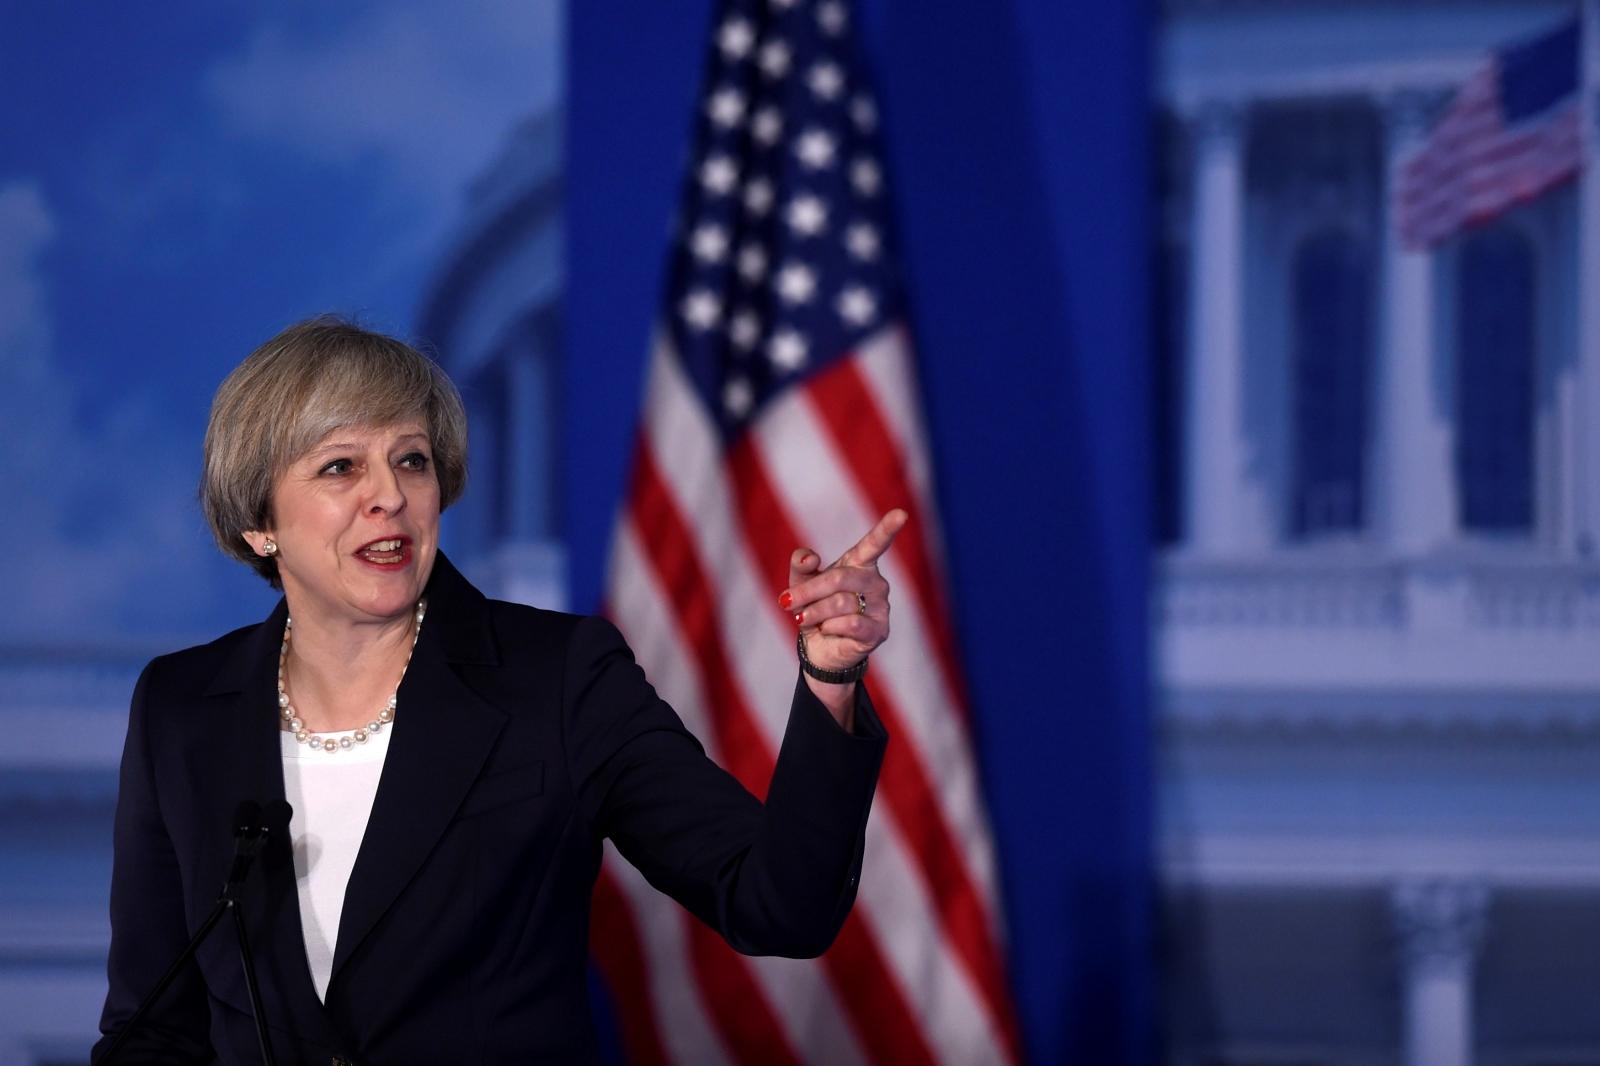 Theresa May Philadelphia